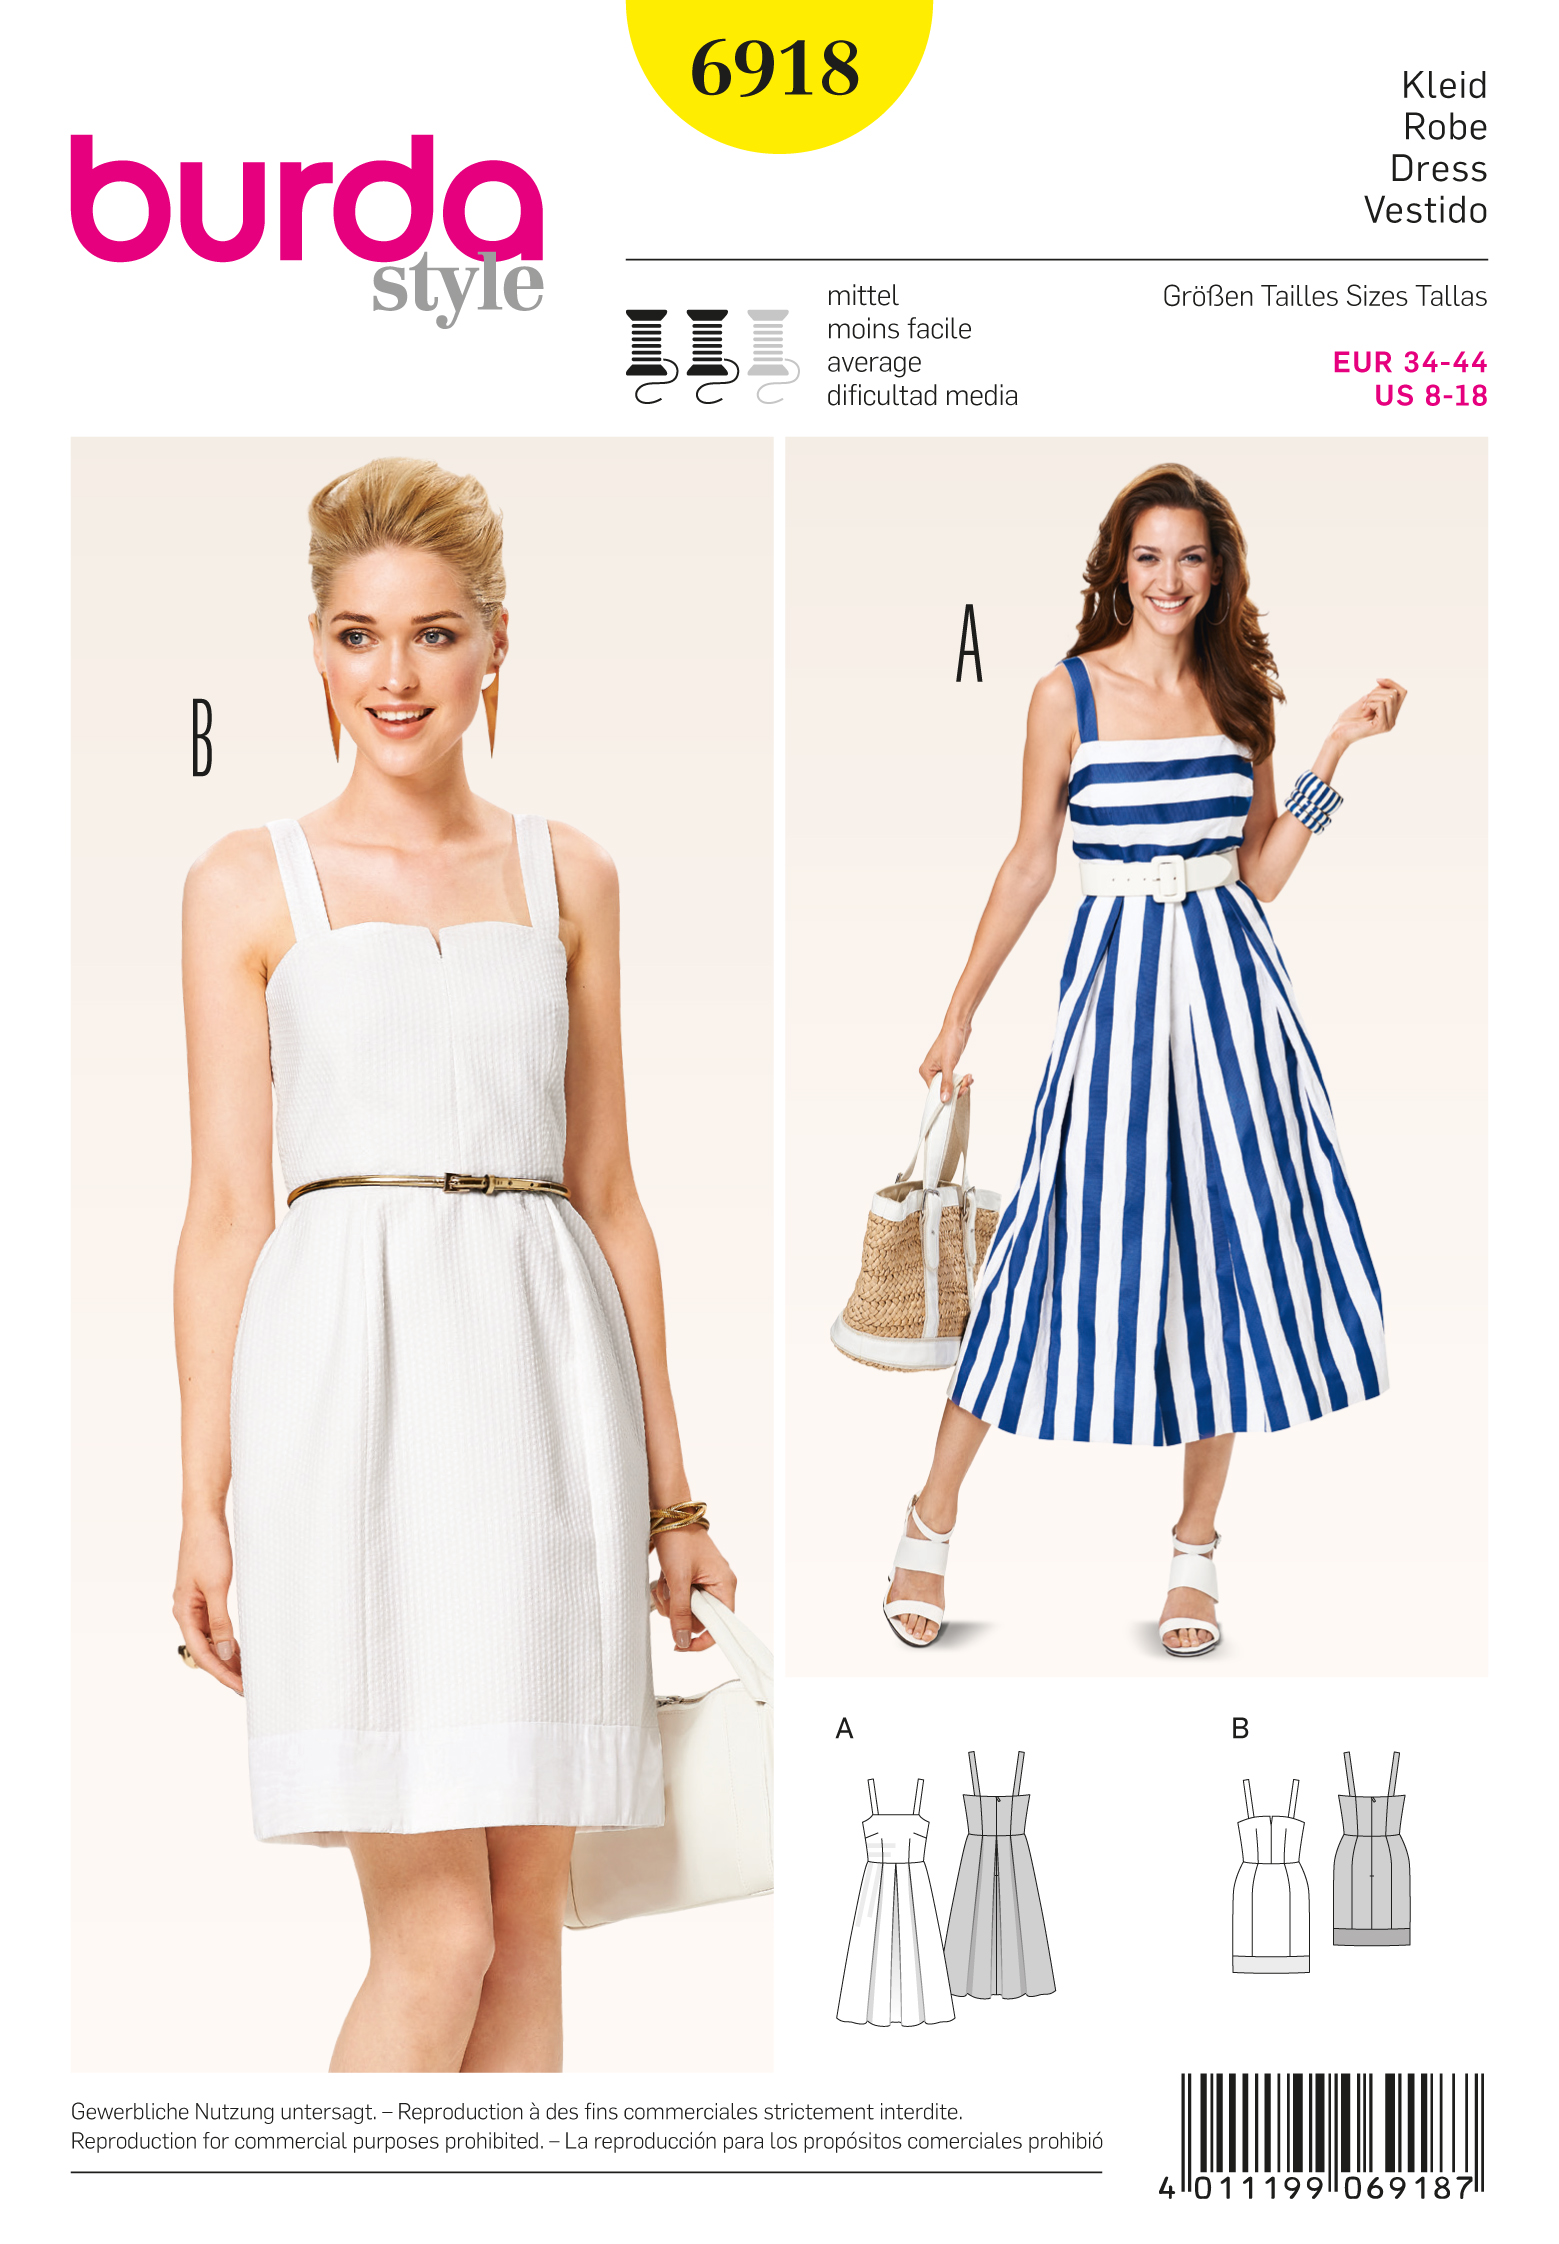 Burda 6918 Dresses